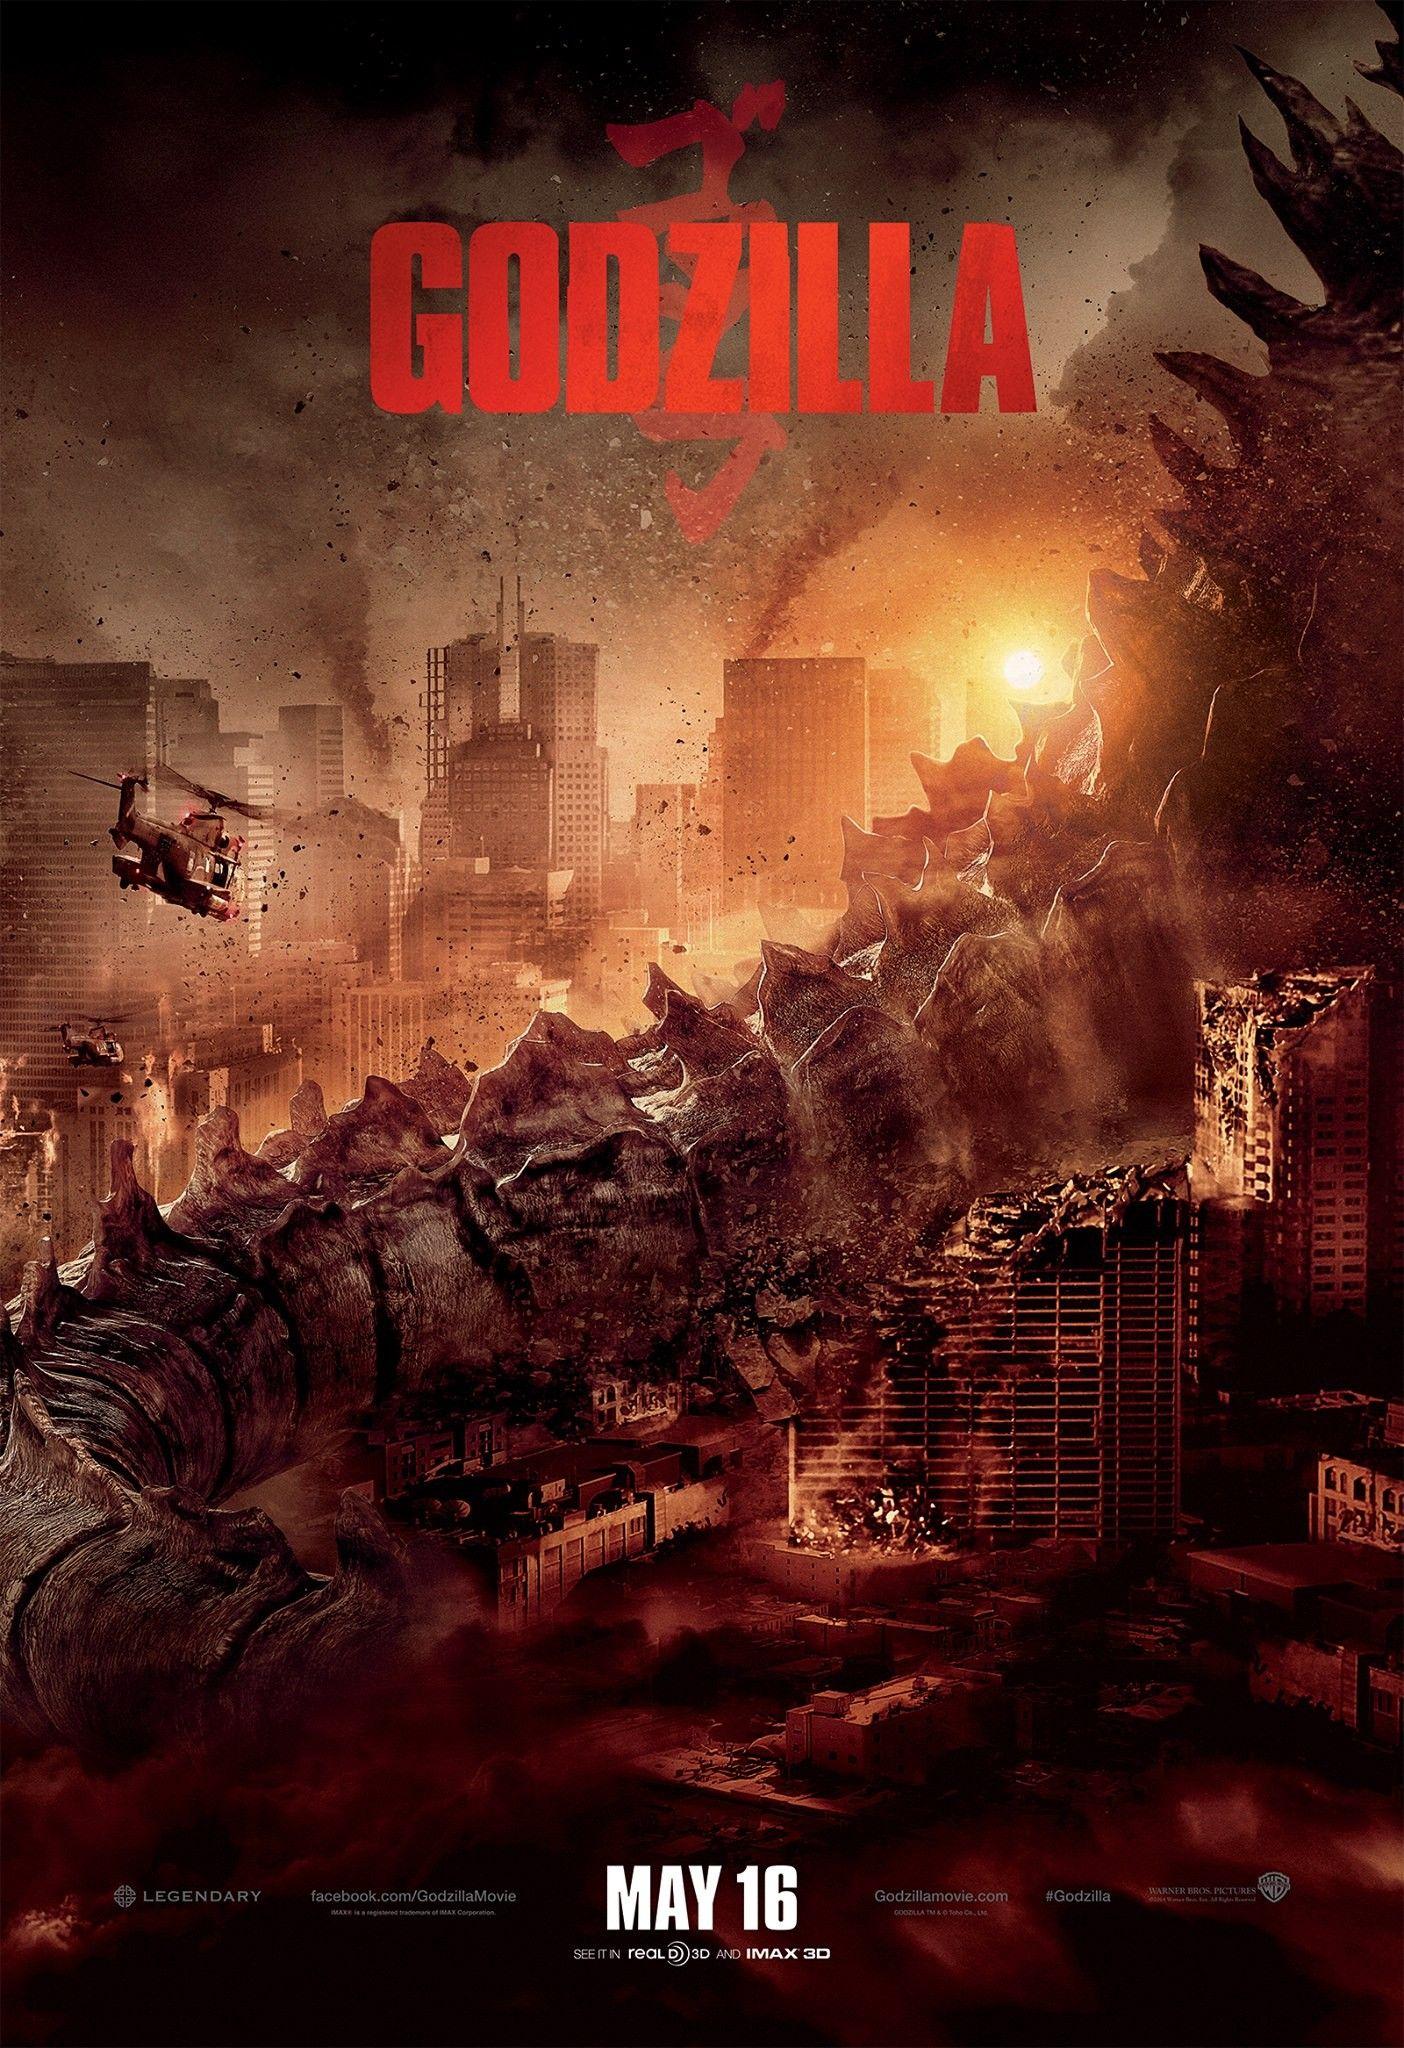 GODZILLA Posters, THE ... Andrew Garfield Imdb